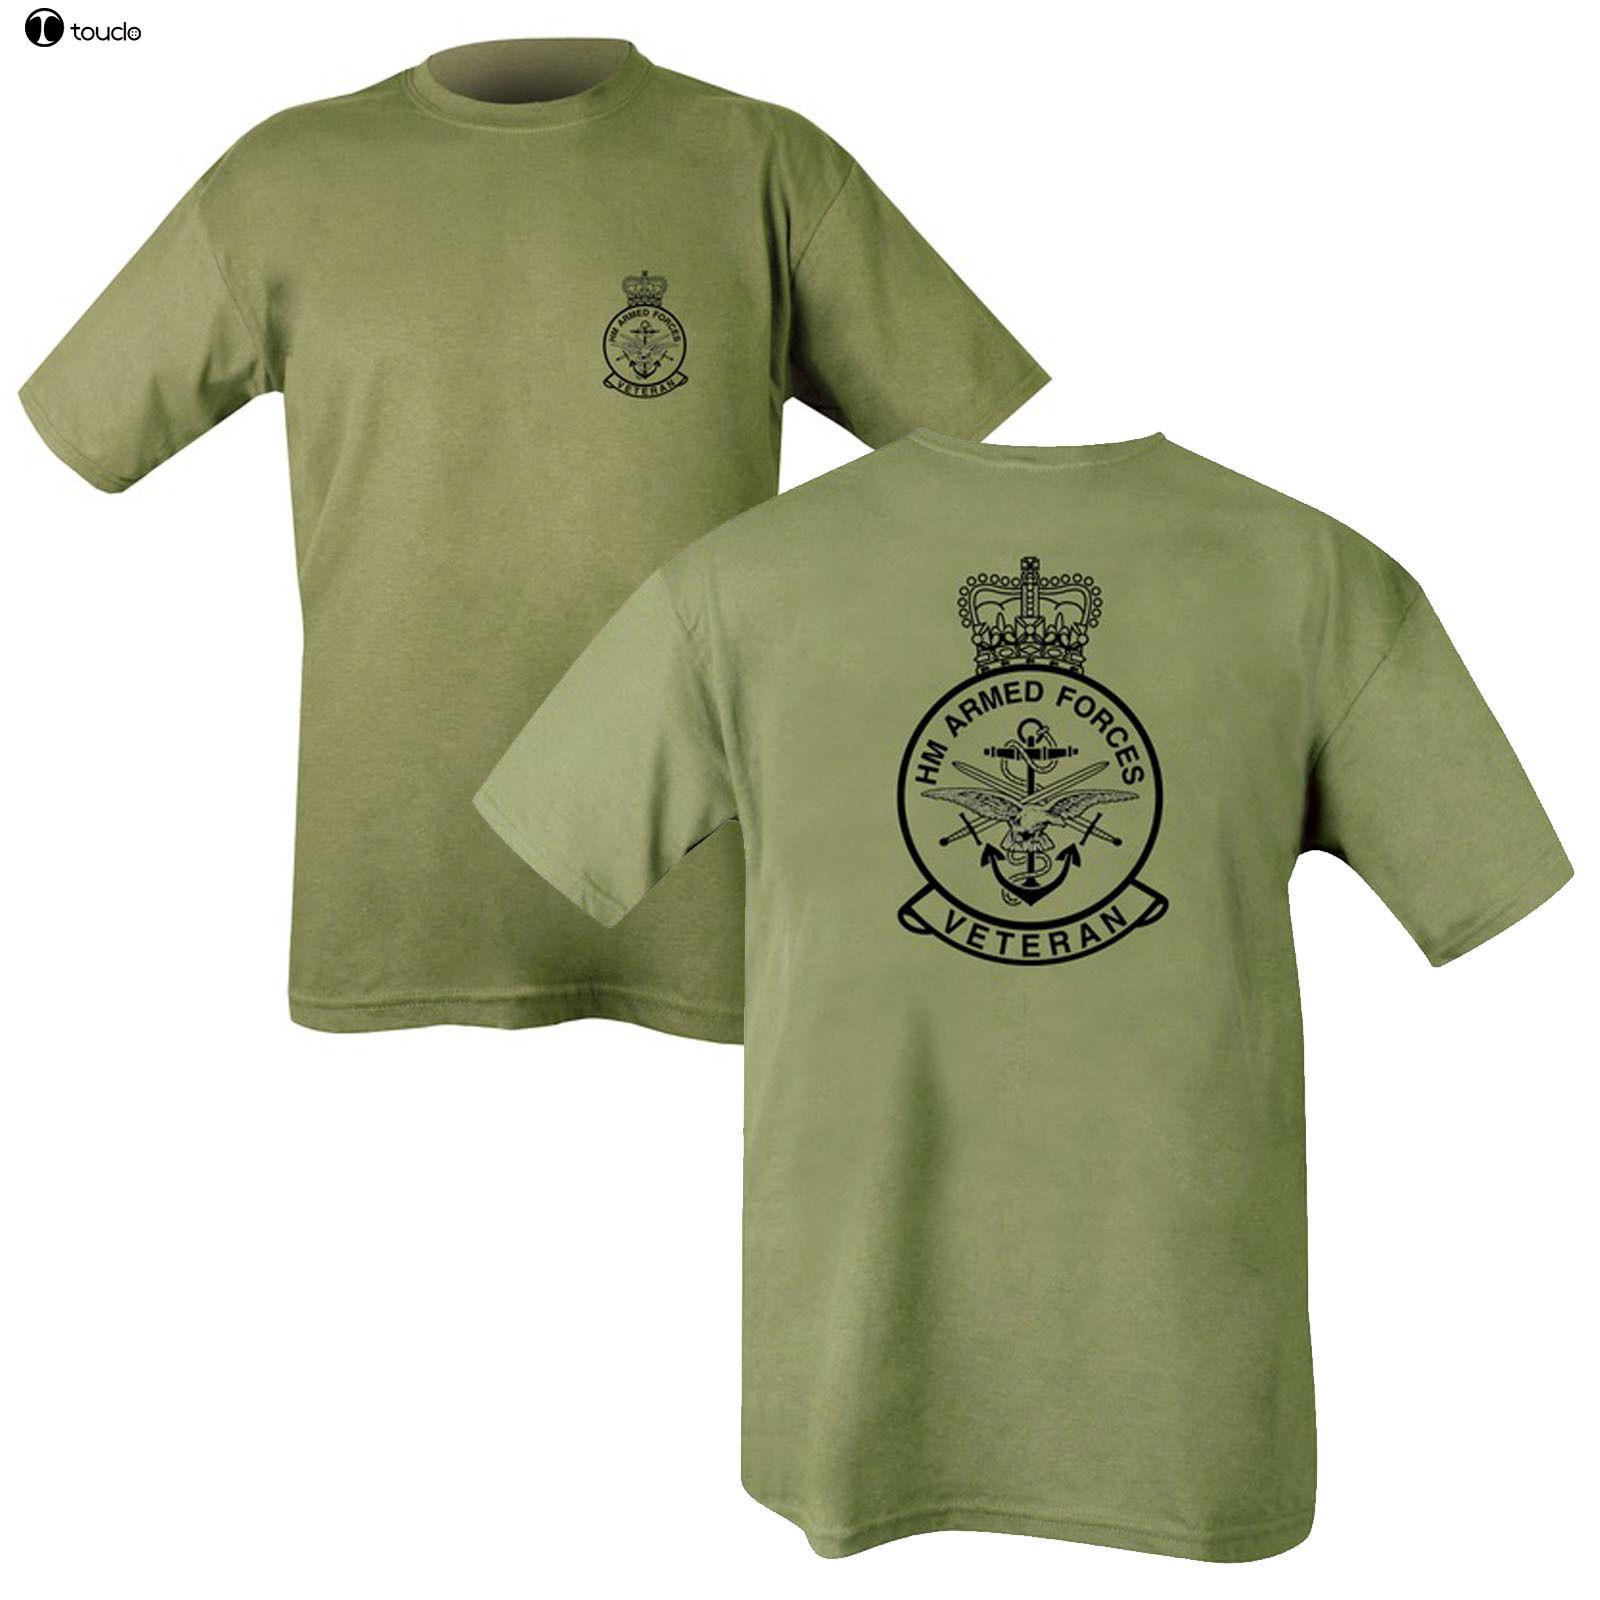 Mens T Shirts Fashion 2019 Printed on Two Sides Army Olive Green T-shirt - Hmrc Abs. Reme RGR RMC SAS Re T Shirt Short Sleeve